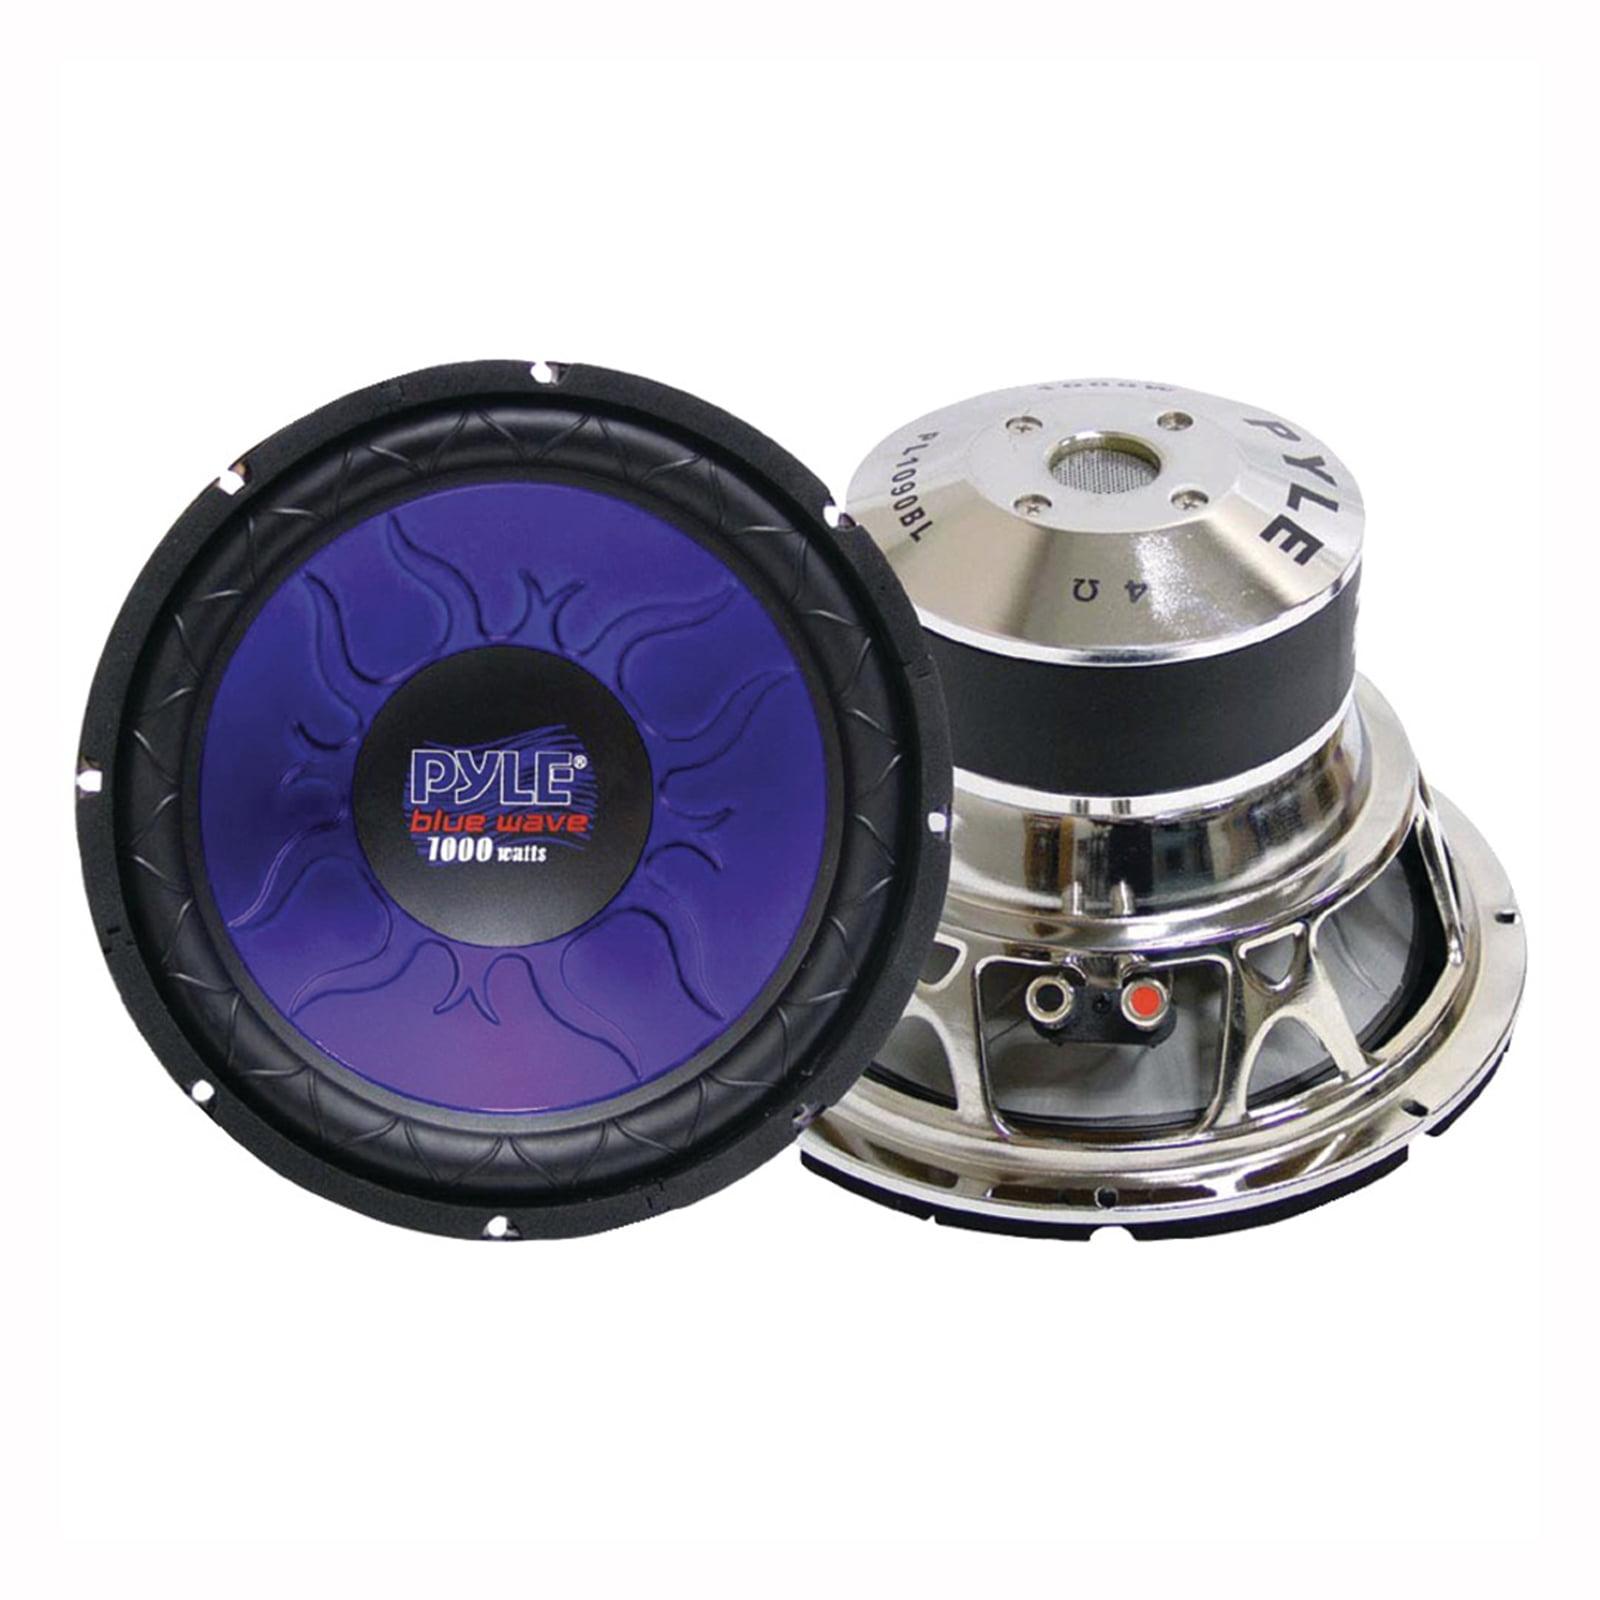 "Pyle 12"" 1200 Watt DVC Subwoofer"